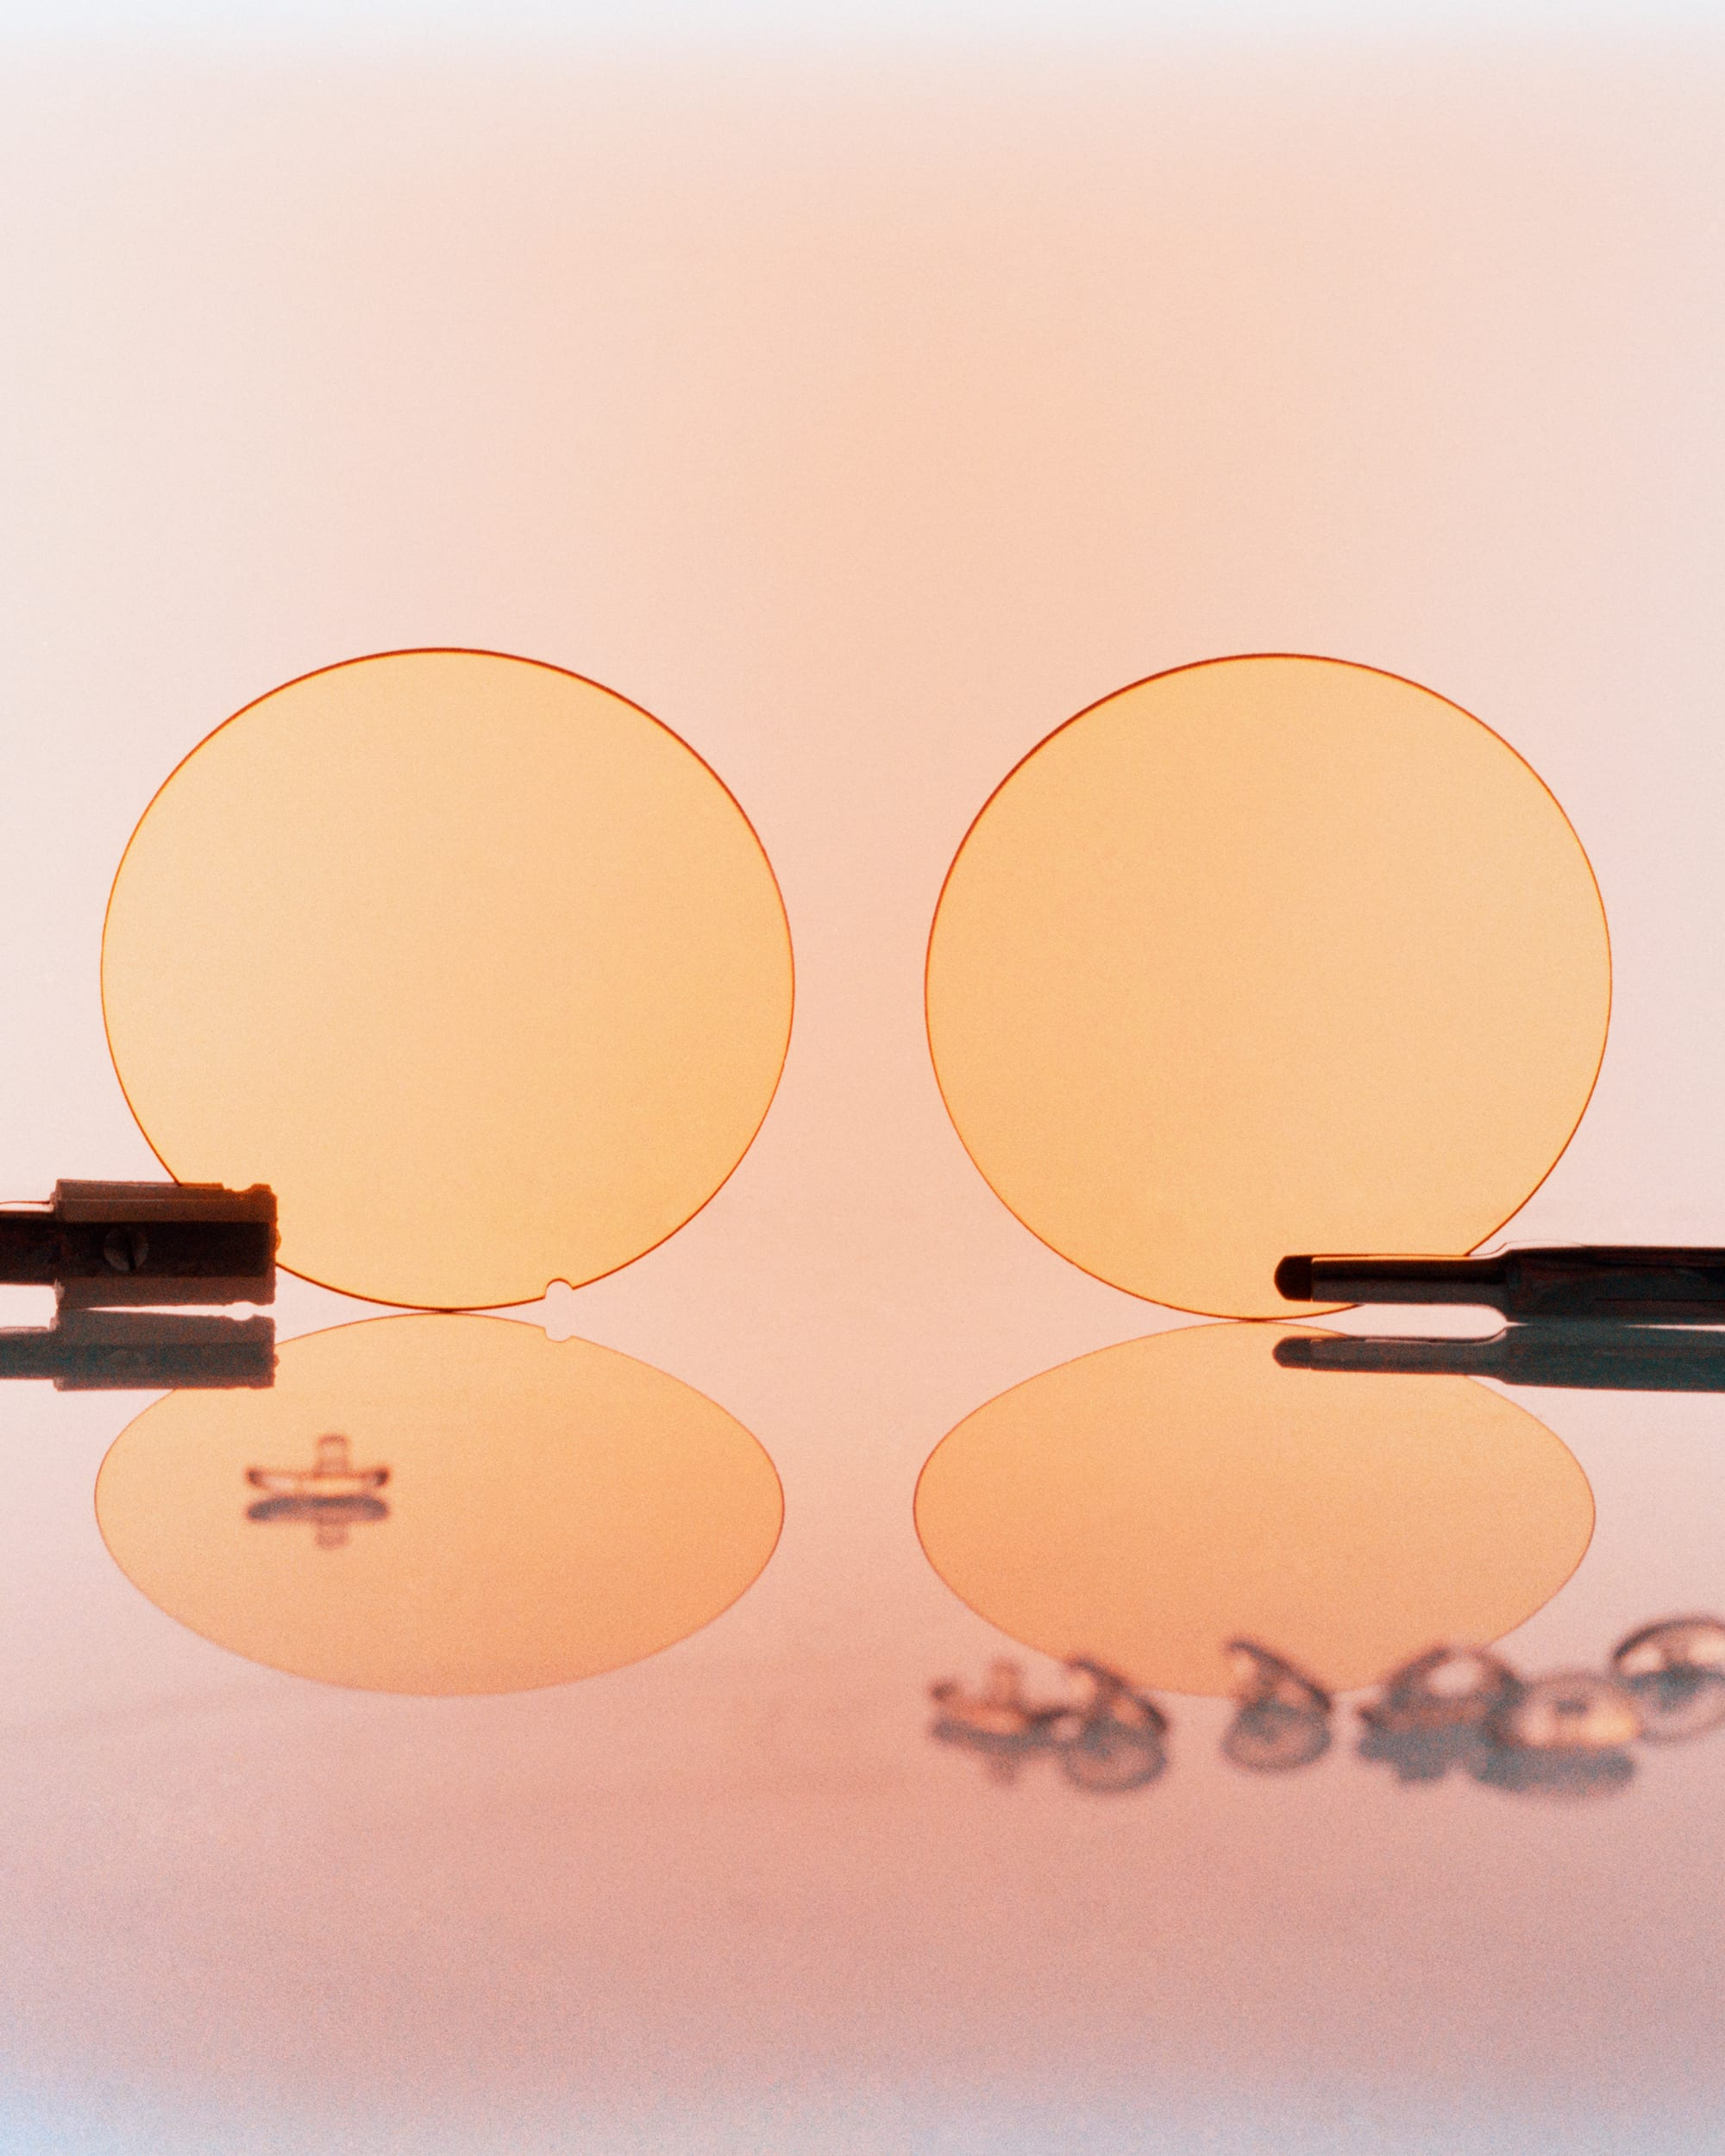 bidules-latest-tools Rein de Wilde optical tools photography